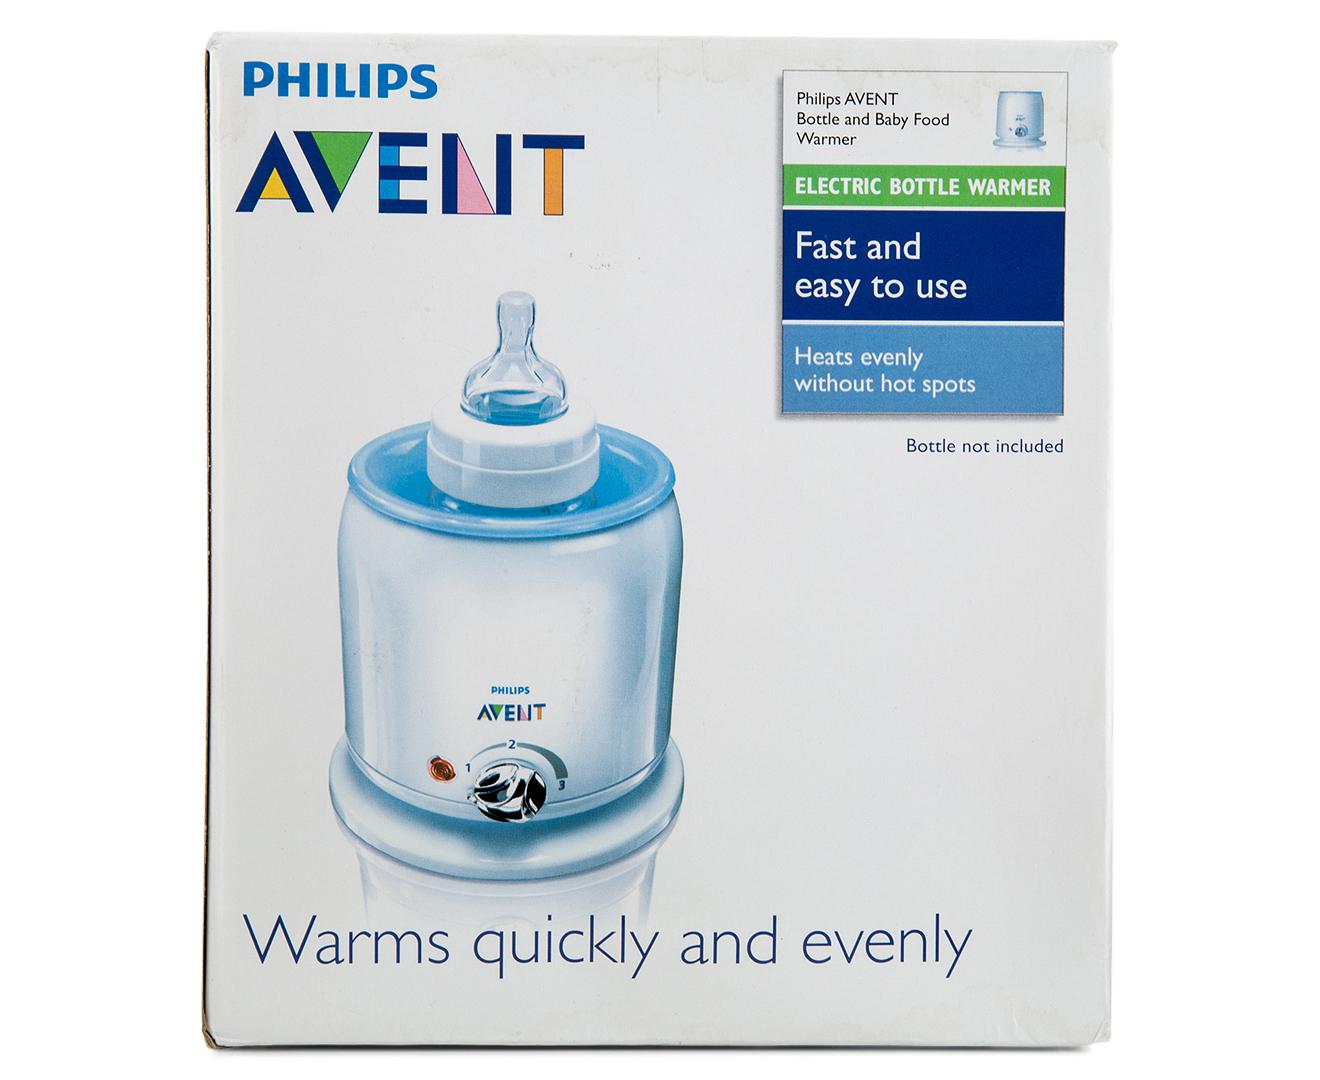 philips avent bottle warmer instructions